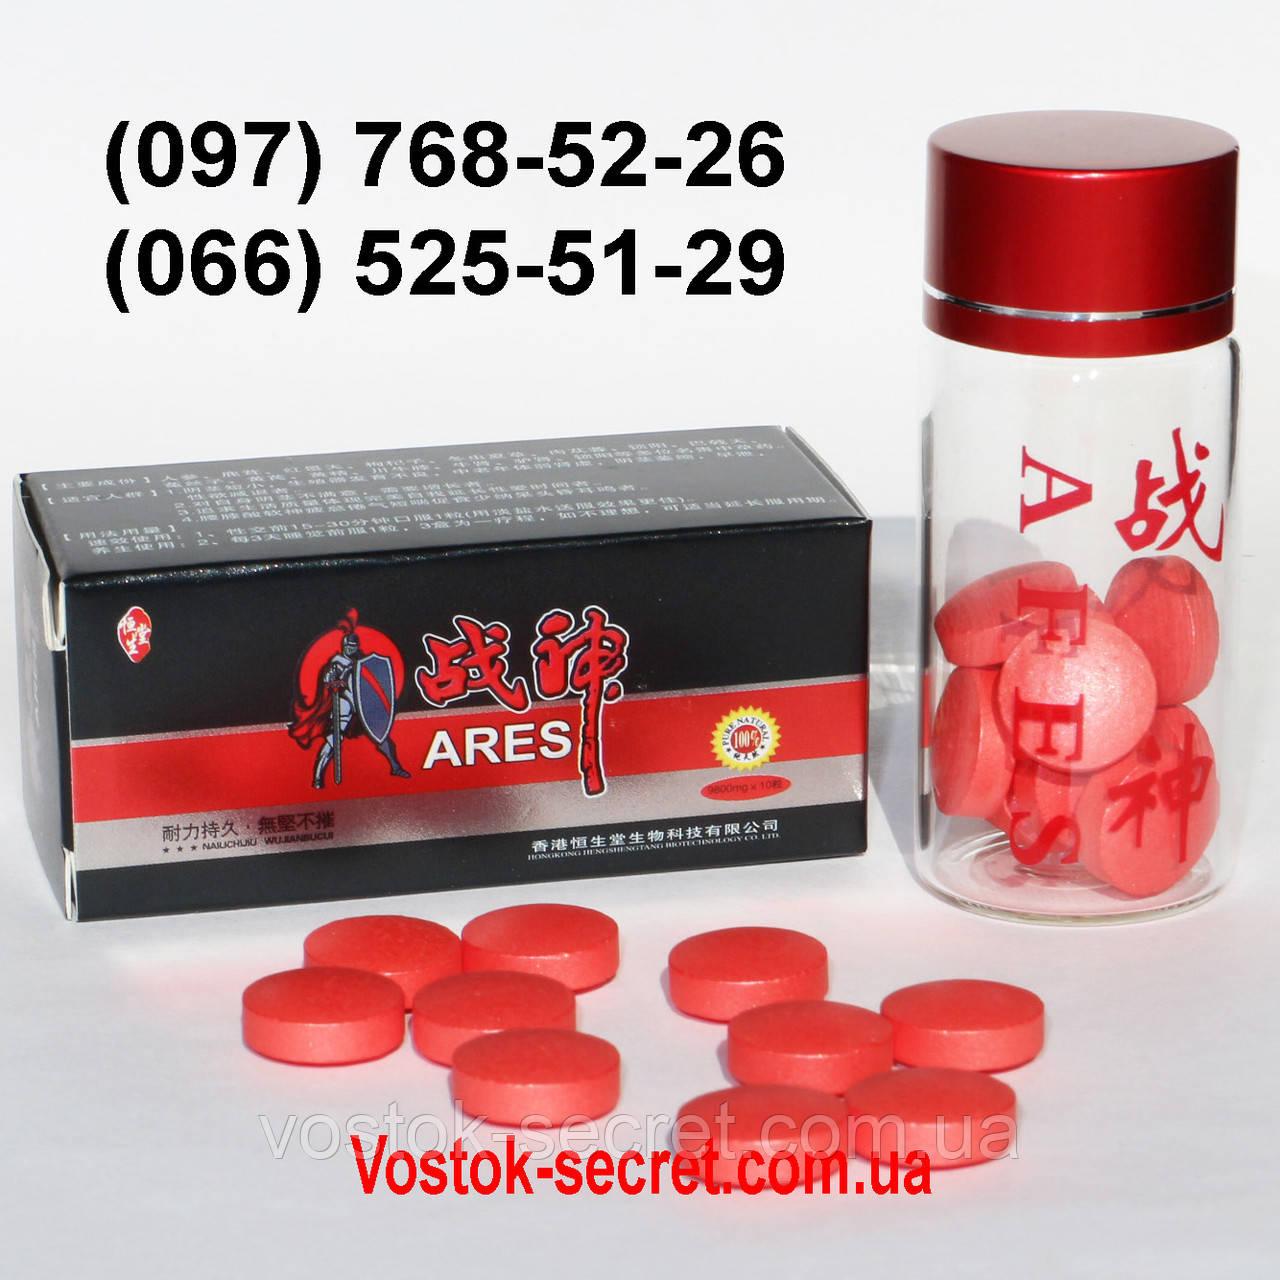 Арес- Препарат для потенции. Ares. 10табл.